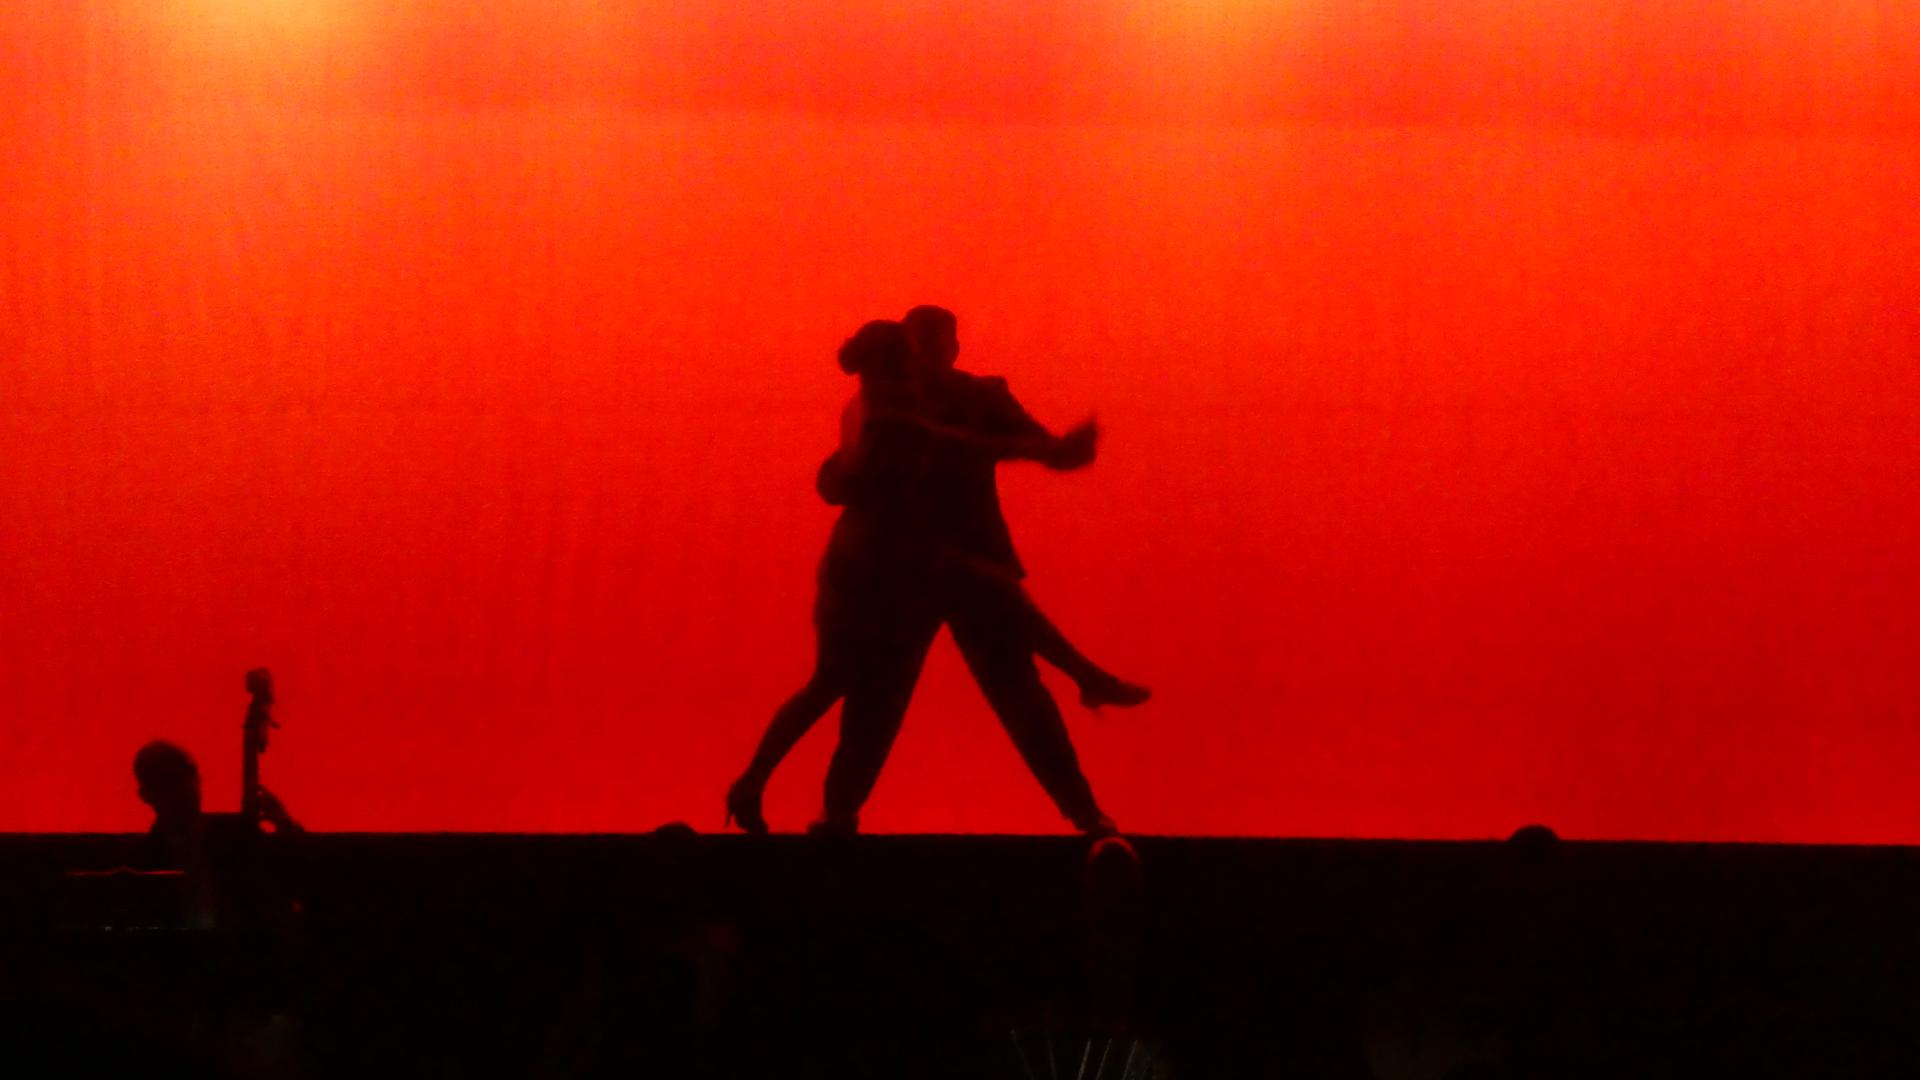 Gambar Tango Merah Hiburan Bayangan Hitam Seni Drama Langit